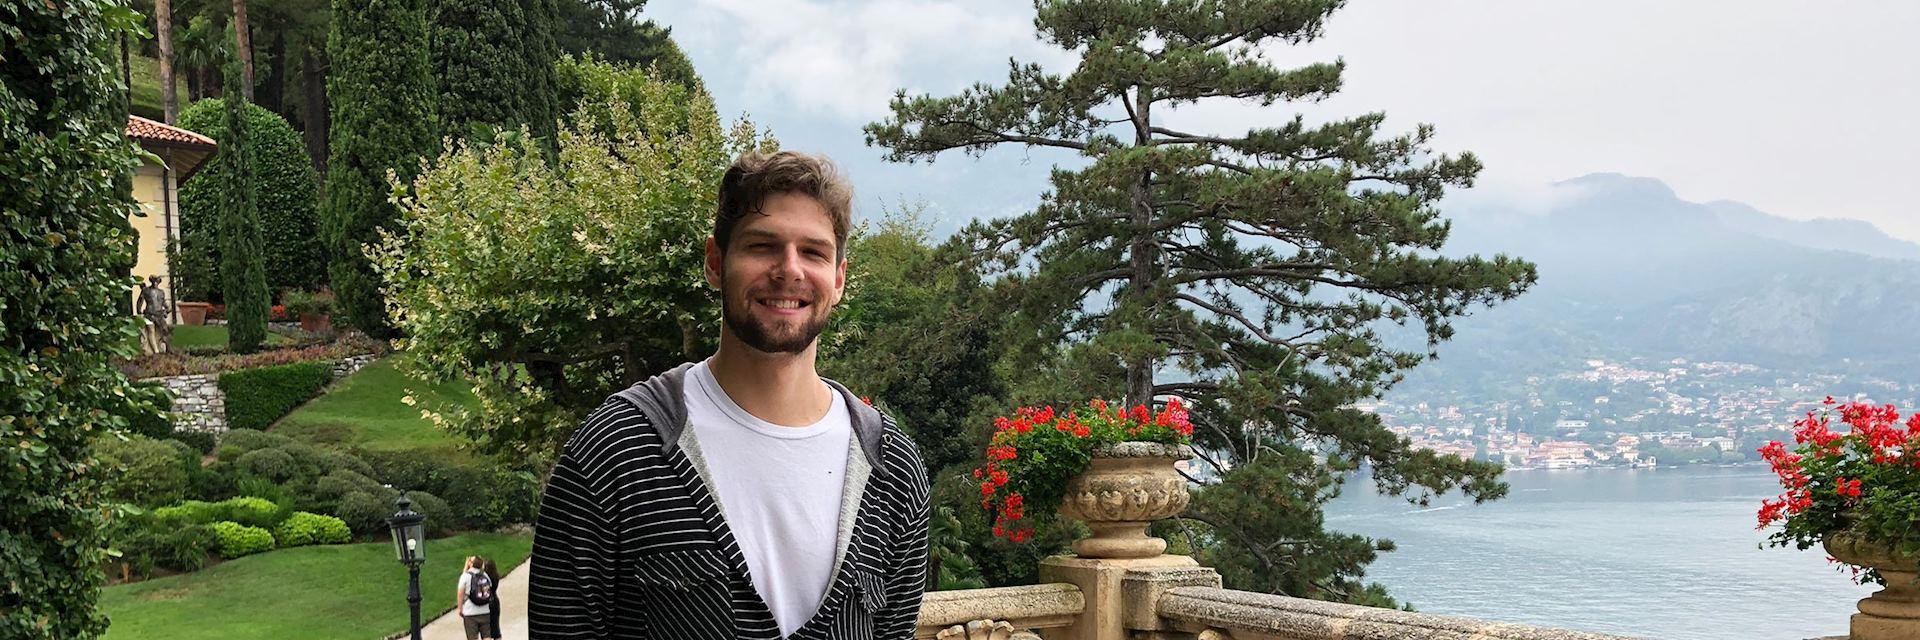 Eric visiting Lake Como, Italy